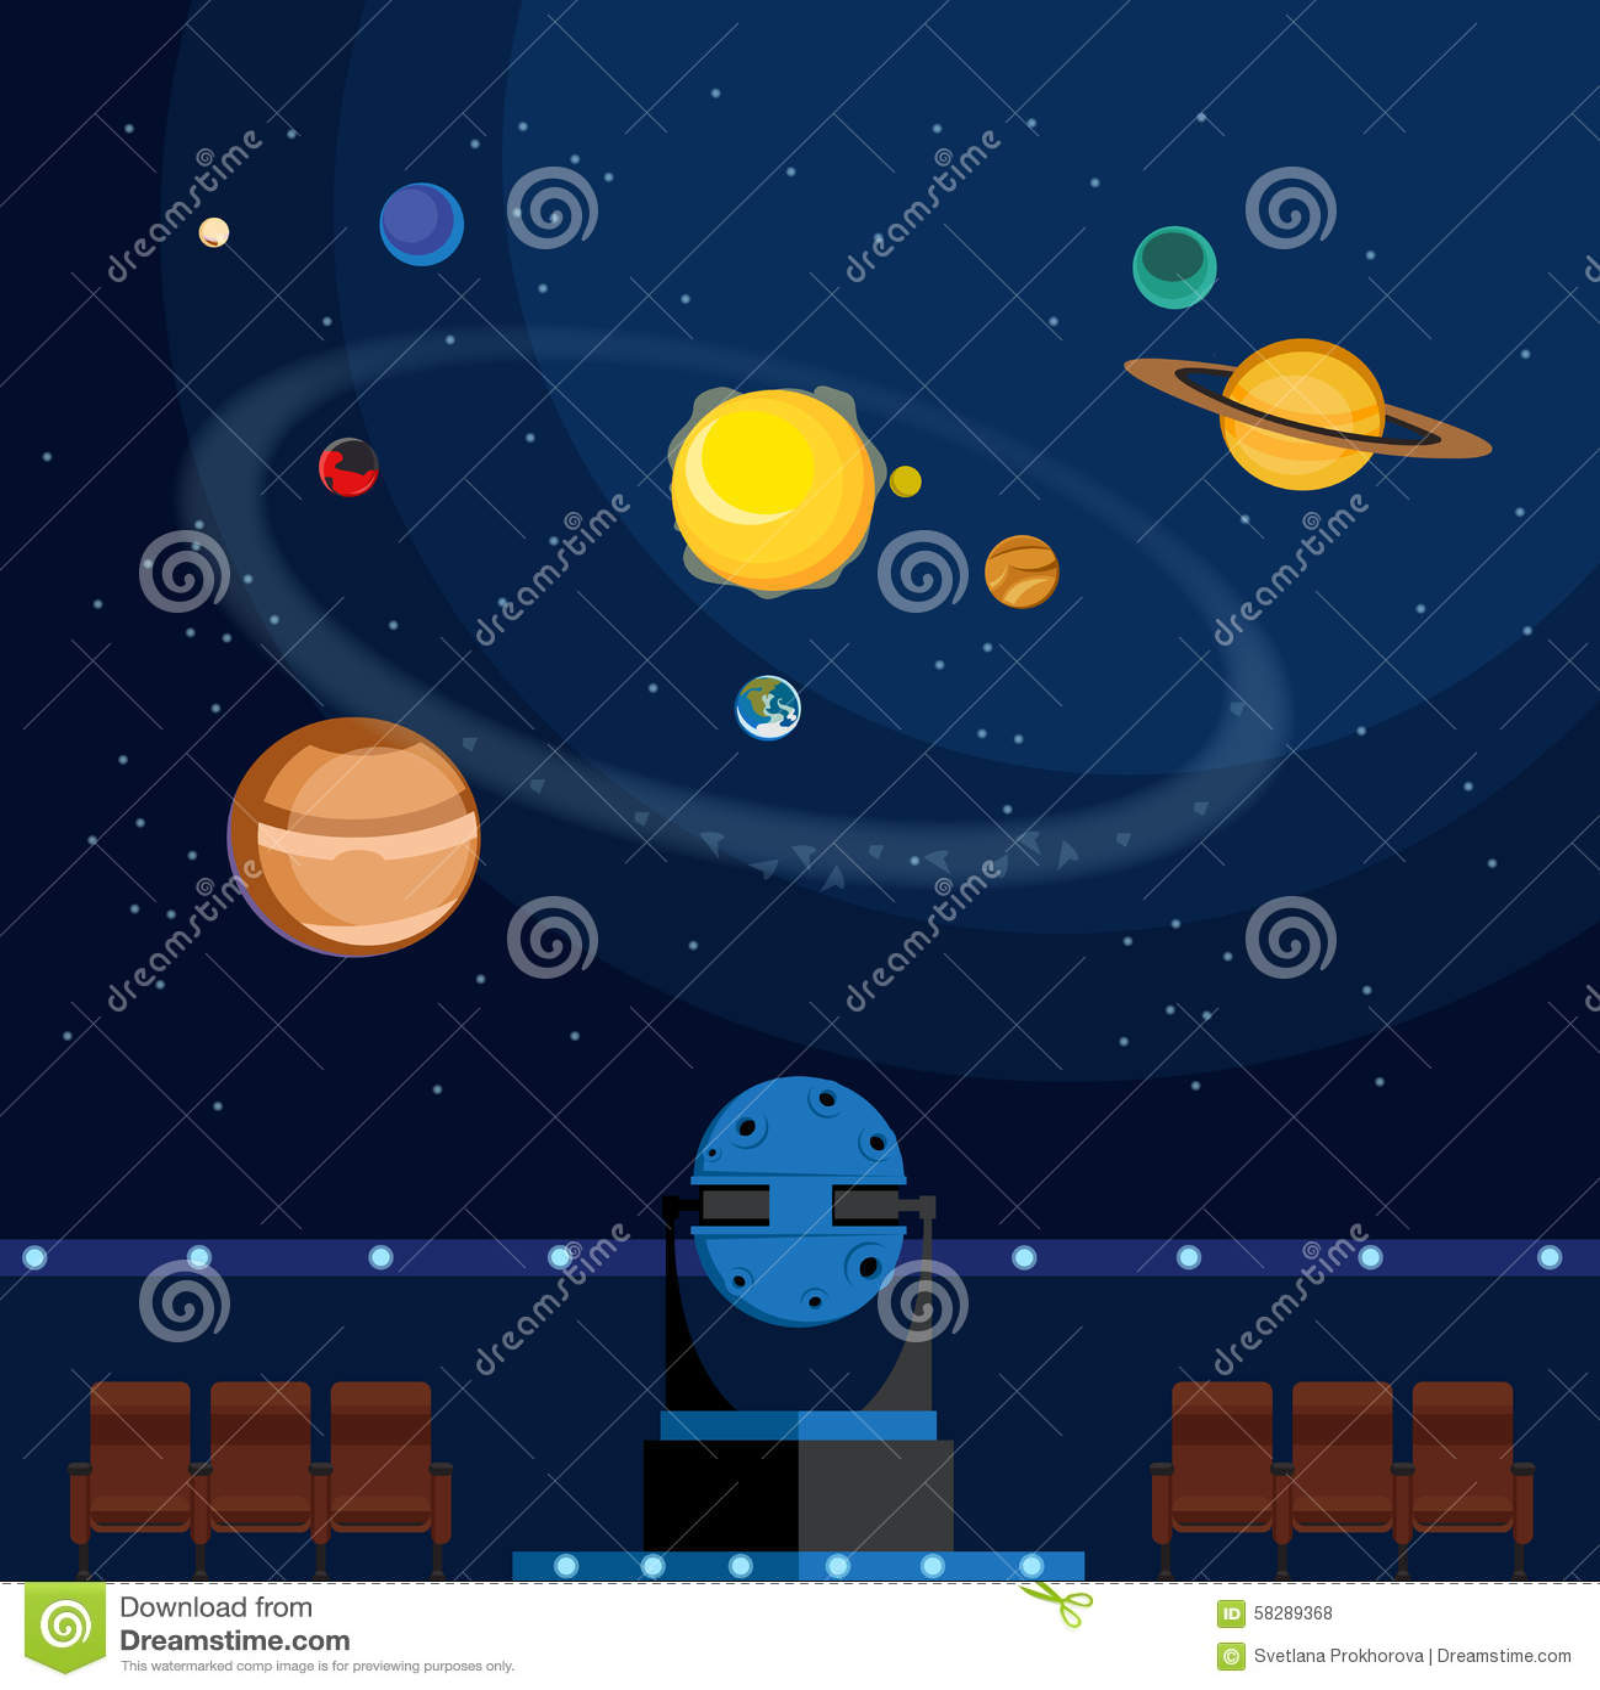 solar system star 2 - photo #47